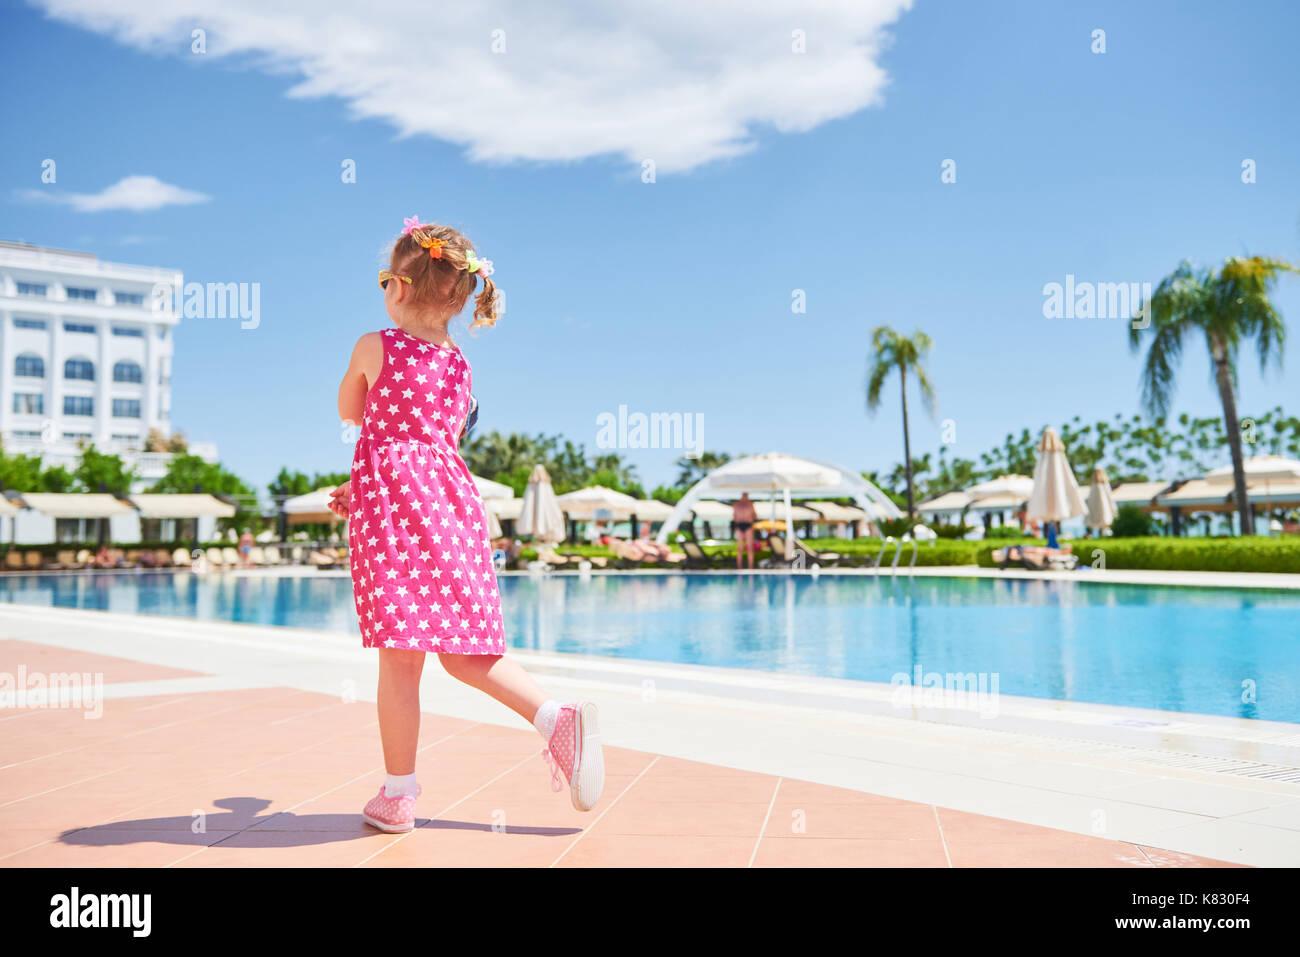 Portrait of a happy girl outdoors in summer day. Amara Dolce Vita Luxury Hotel. Resort. Tekirova-Kemer. Turkey. Stock Photo